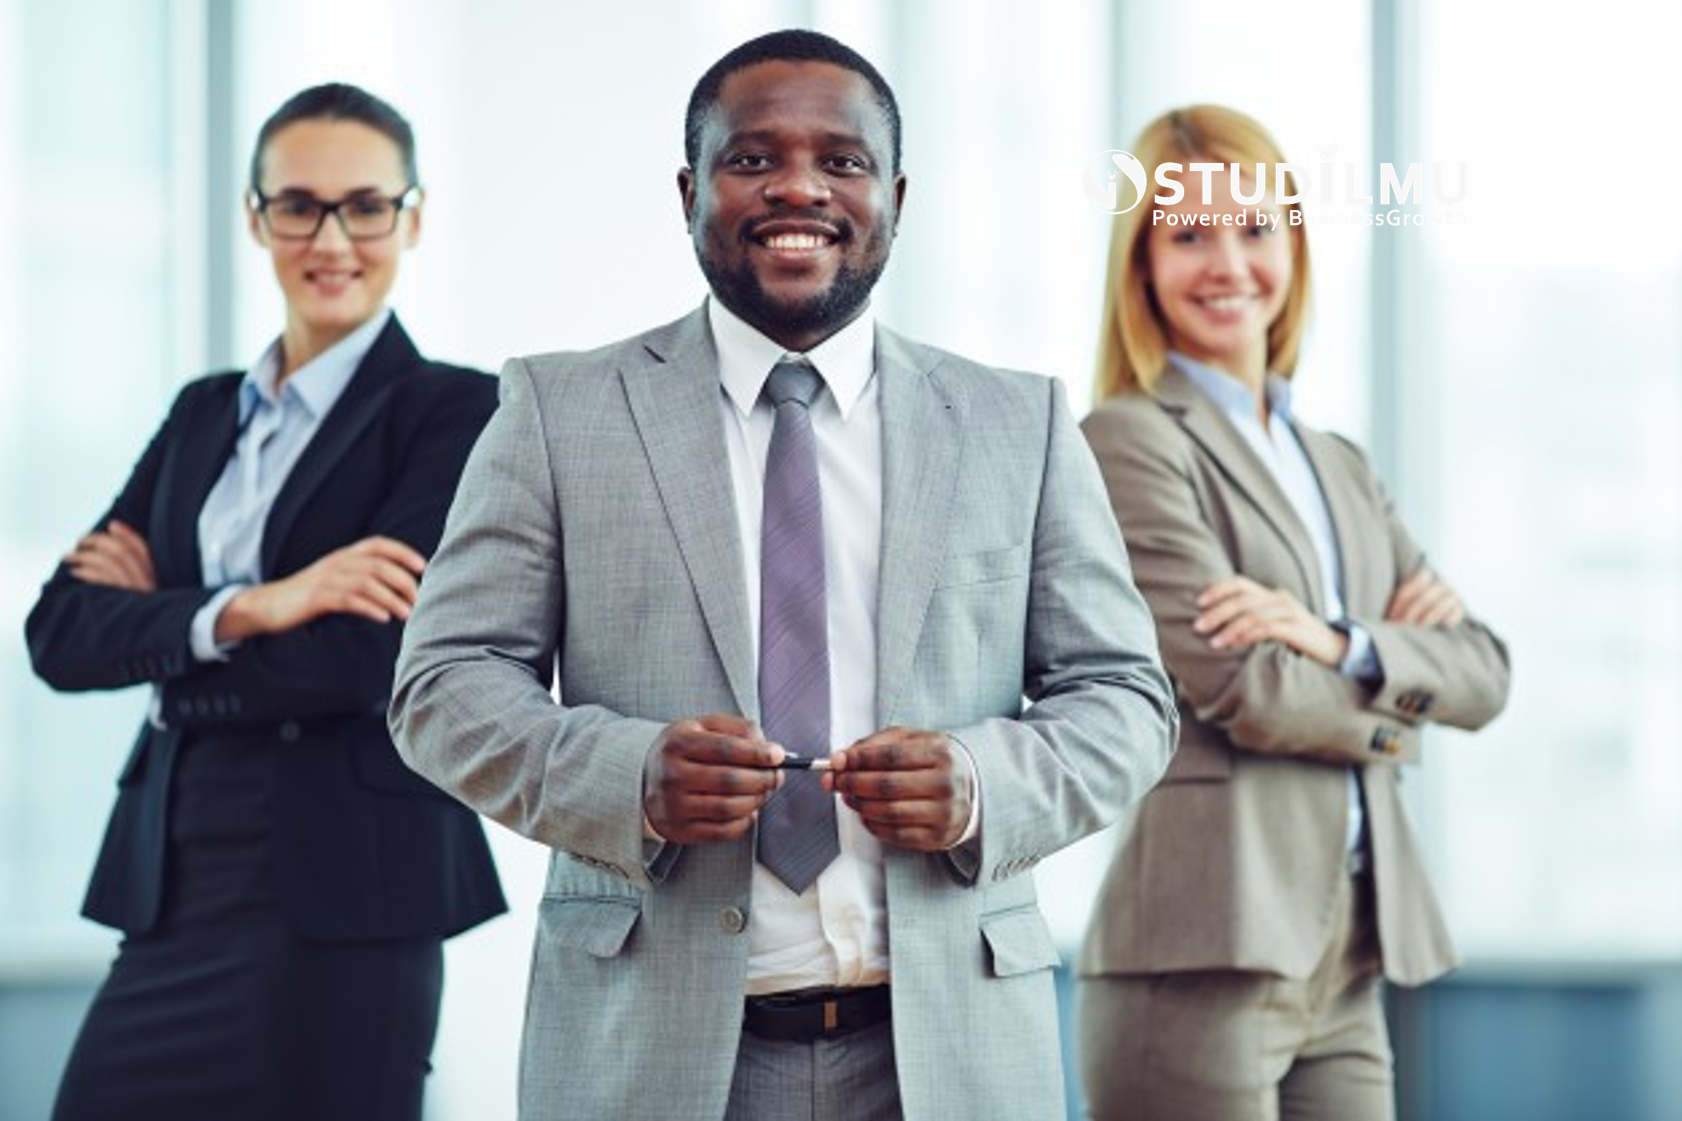 STUDILMU Career Advice - 3 Cara Menjaga Sikap Positif